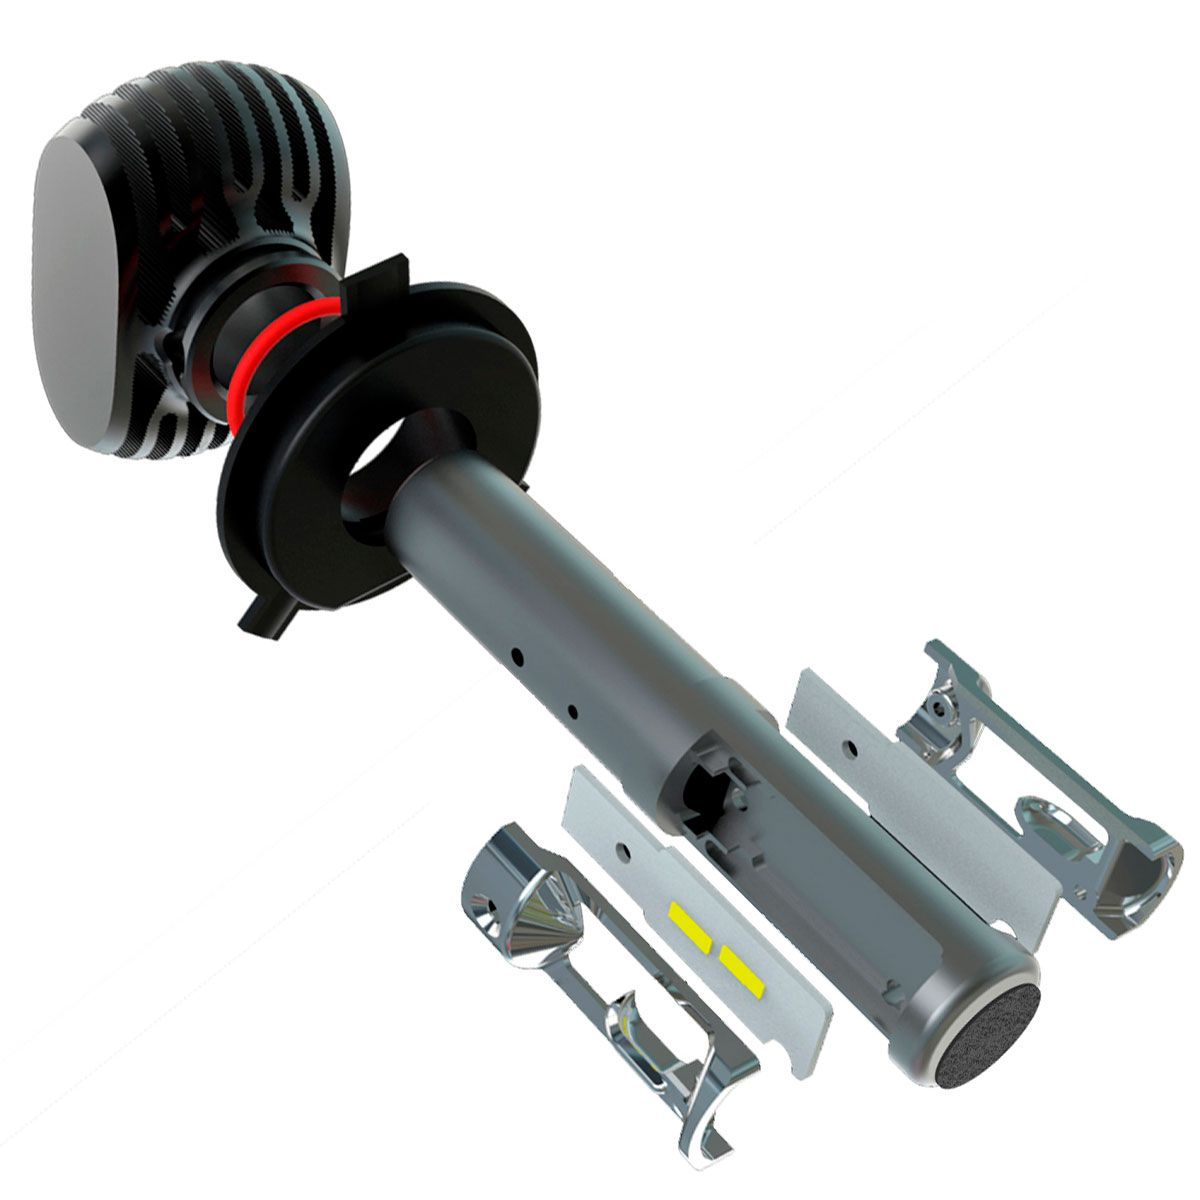 Kit Ultra LED Clio 2004 2005 2006 2007 2008 2009 2010 2011 2012 tipo xenon farol baixo H7 50W